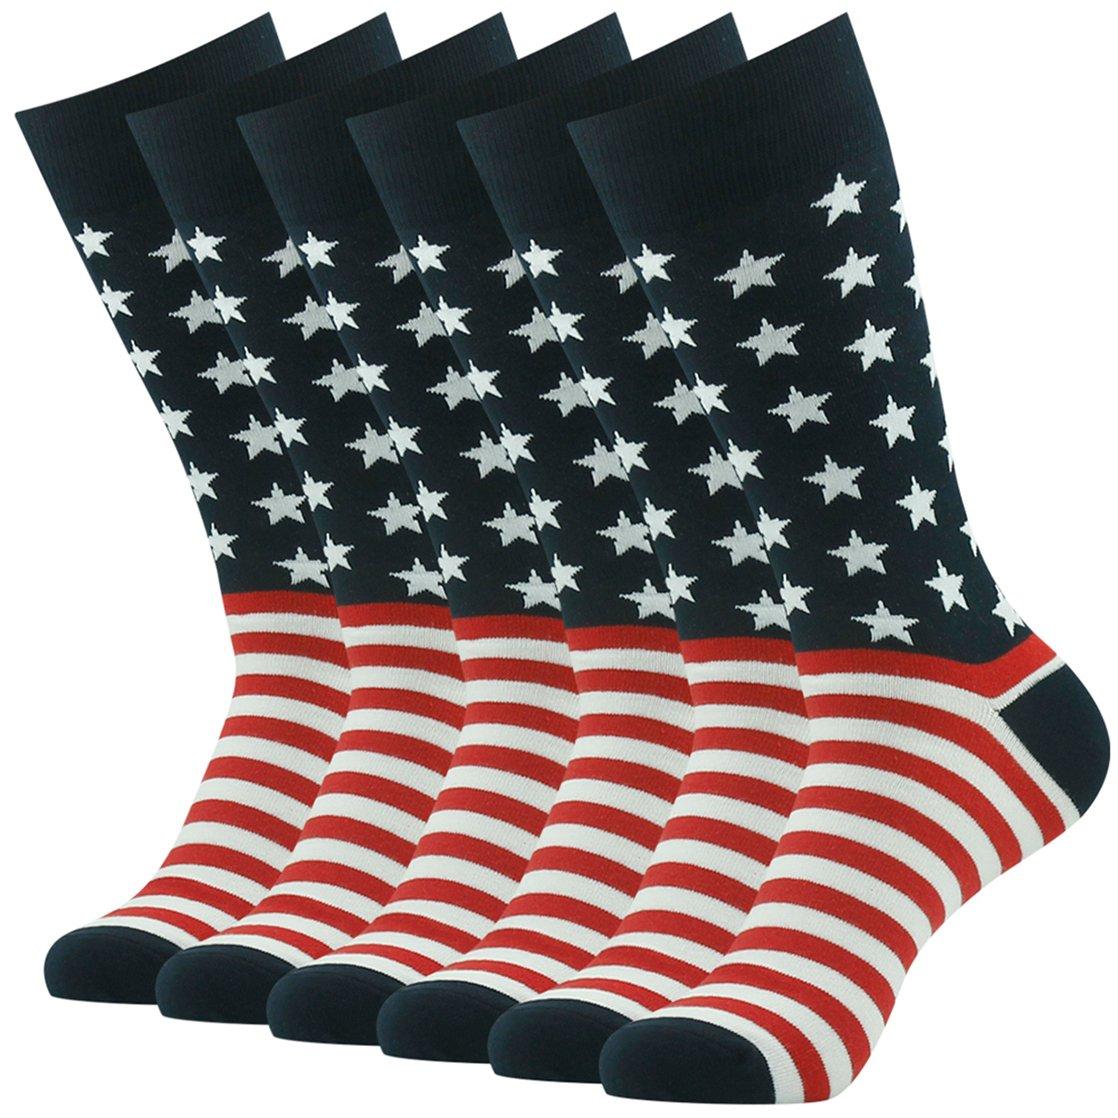 American Flag Socks, SUTTOS Mens Flag Casual Socks 4 of July American US Glory Flag Star Stripe Dress Suits Socks Men's Colorful American Flag Patriot Dress Socks for Groomsmen Back to School Socks,6 Pairs